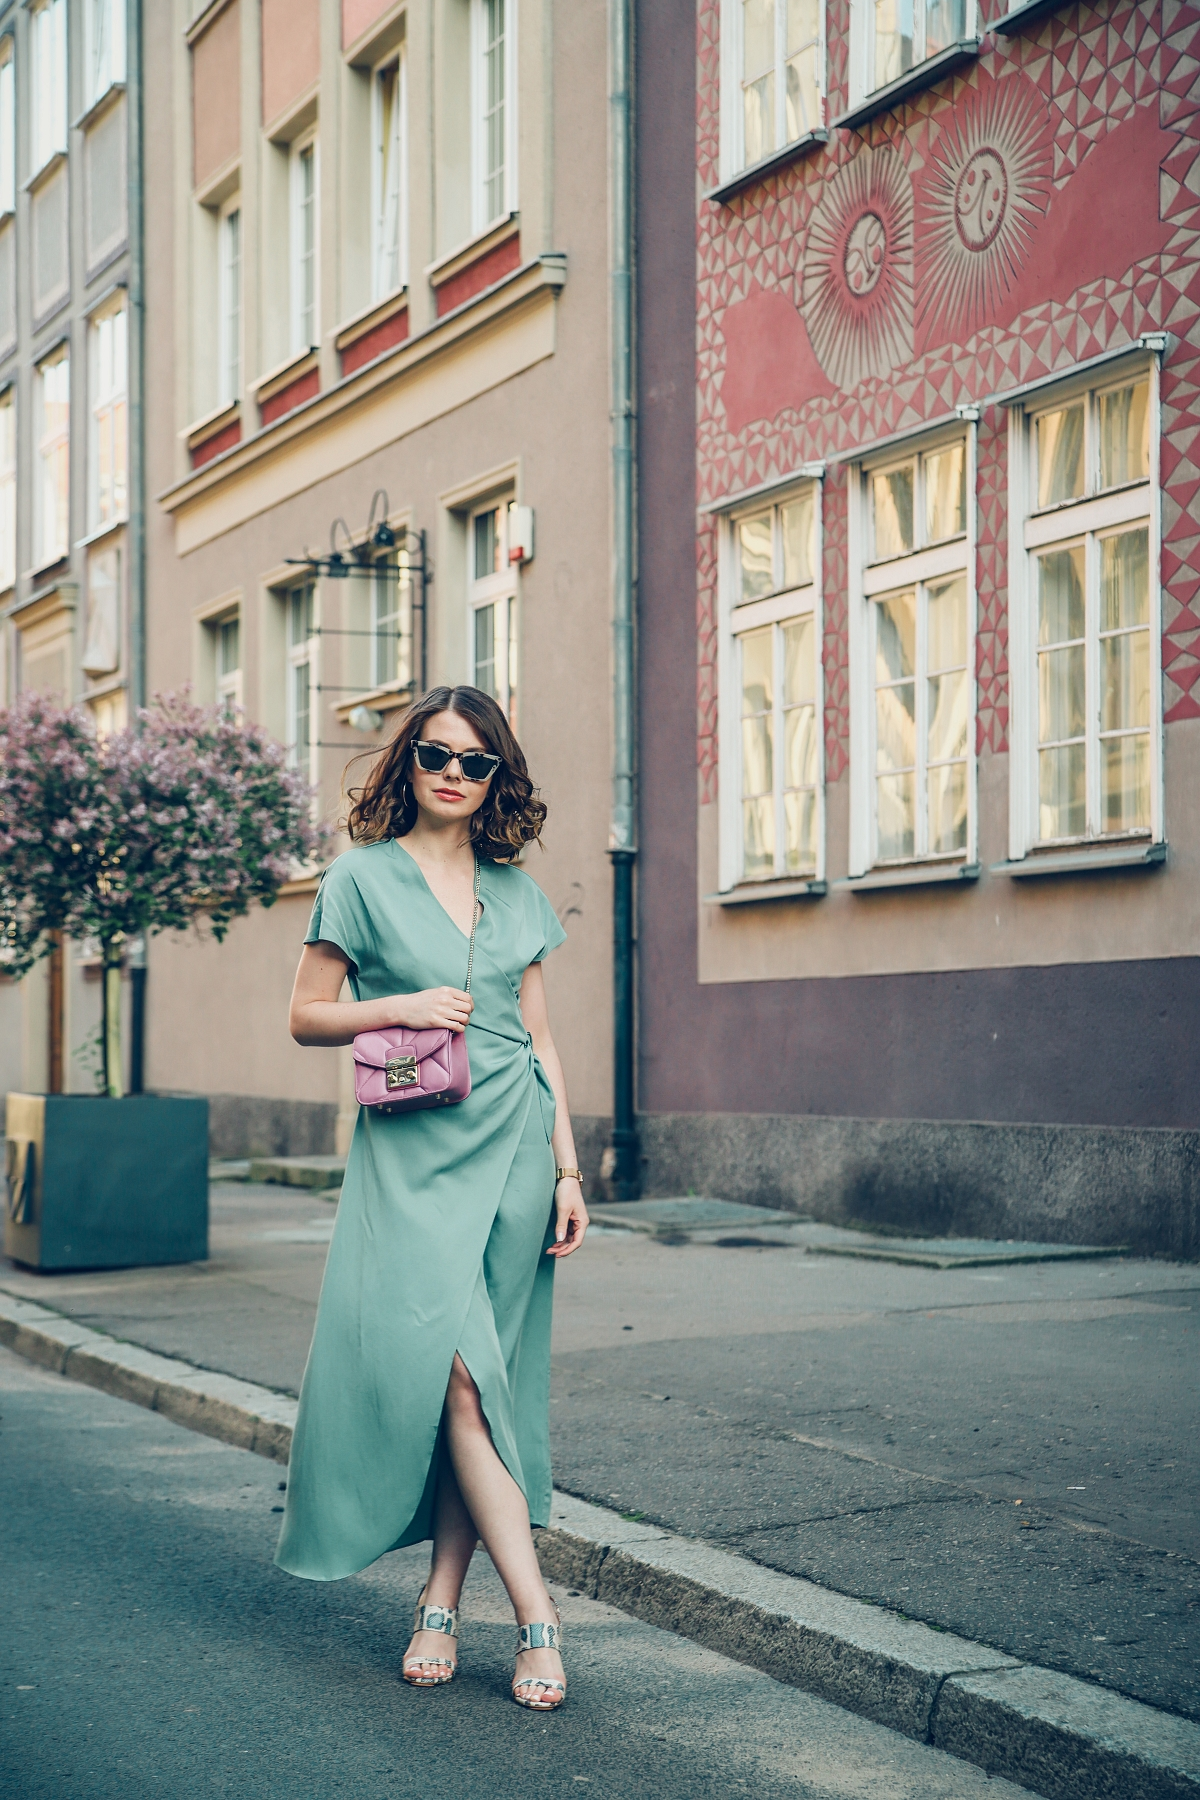 jak-nosić-kolor-lawendowy-trend-kolory-mieta-3